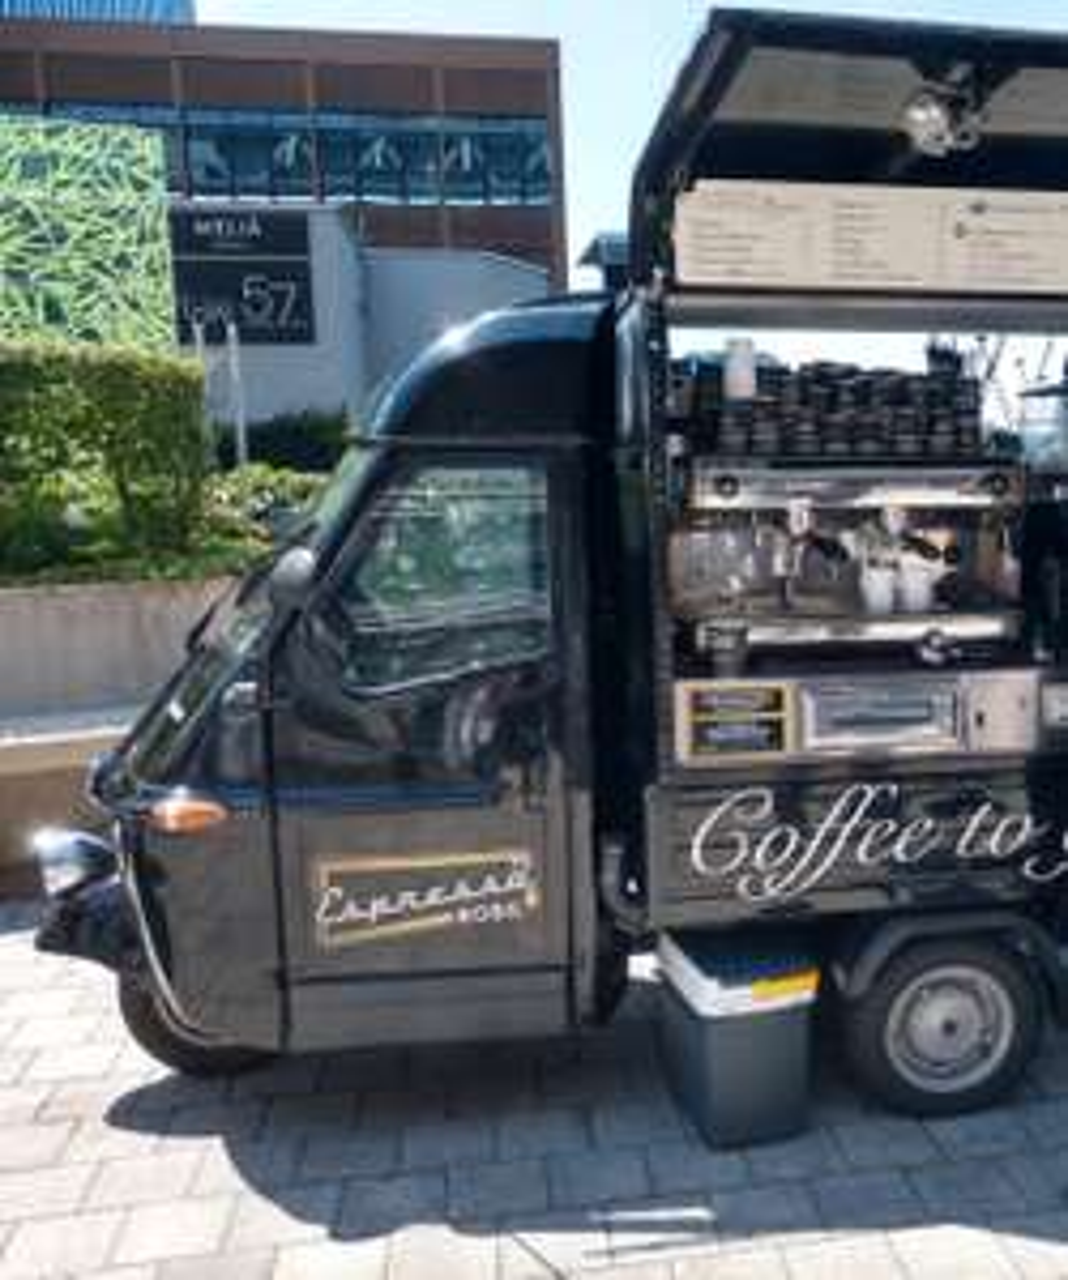 Gratis Eiskaffee vor dem DC Tower